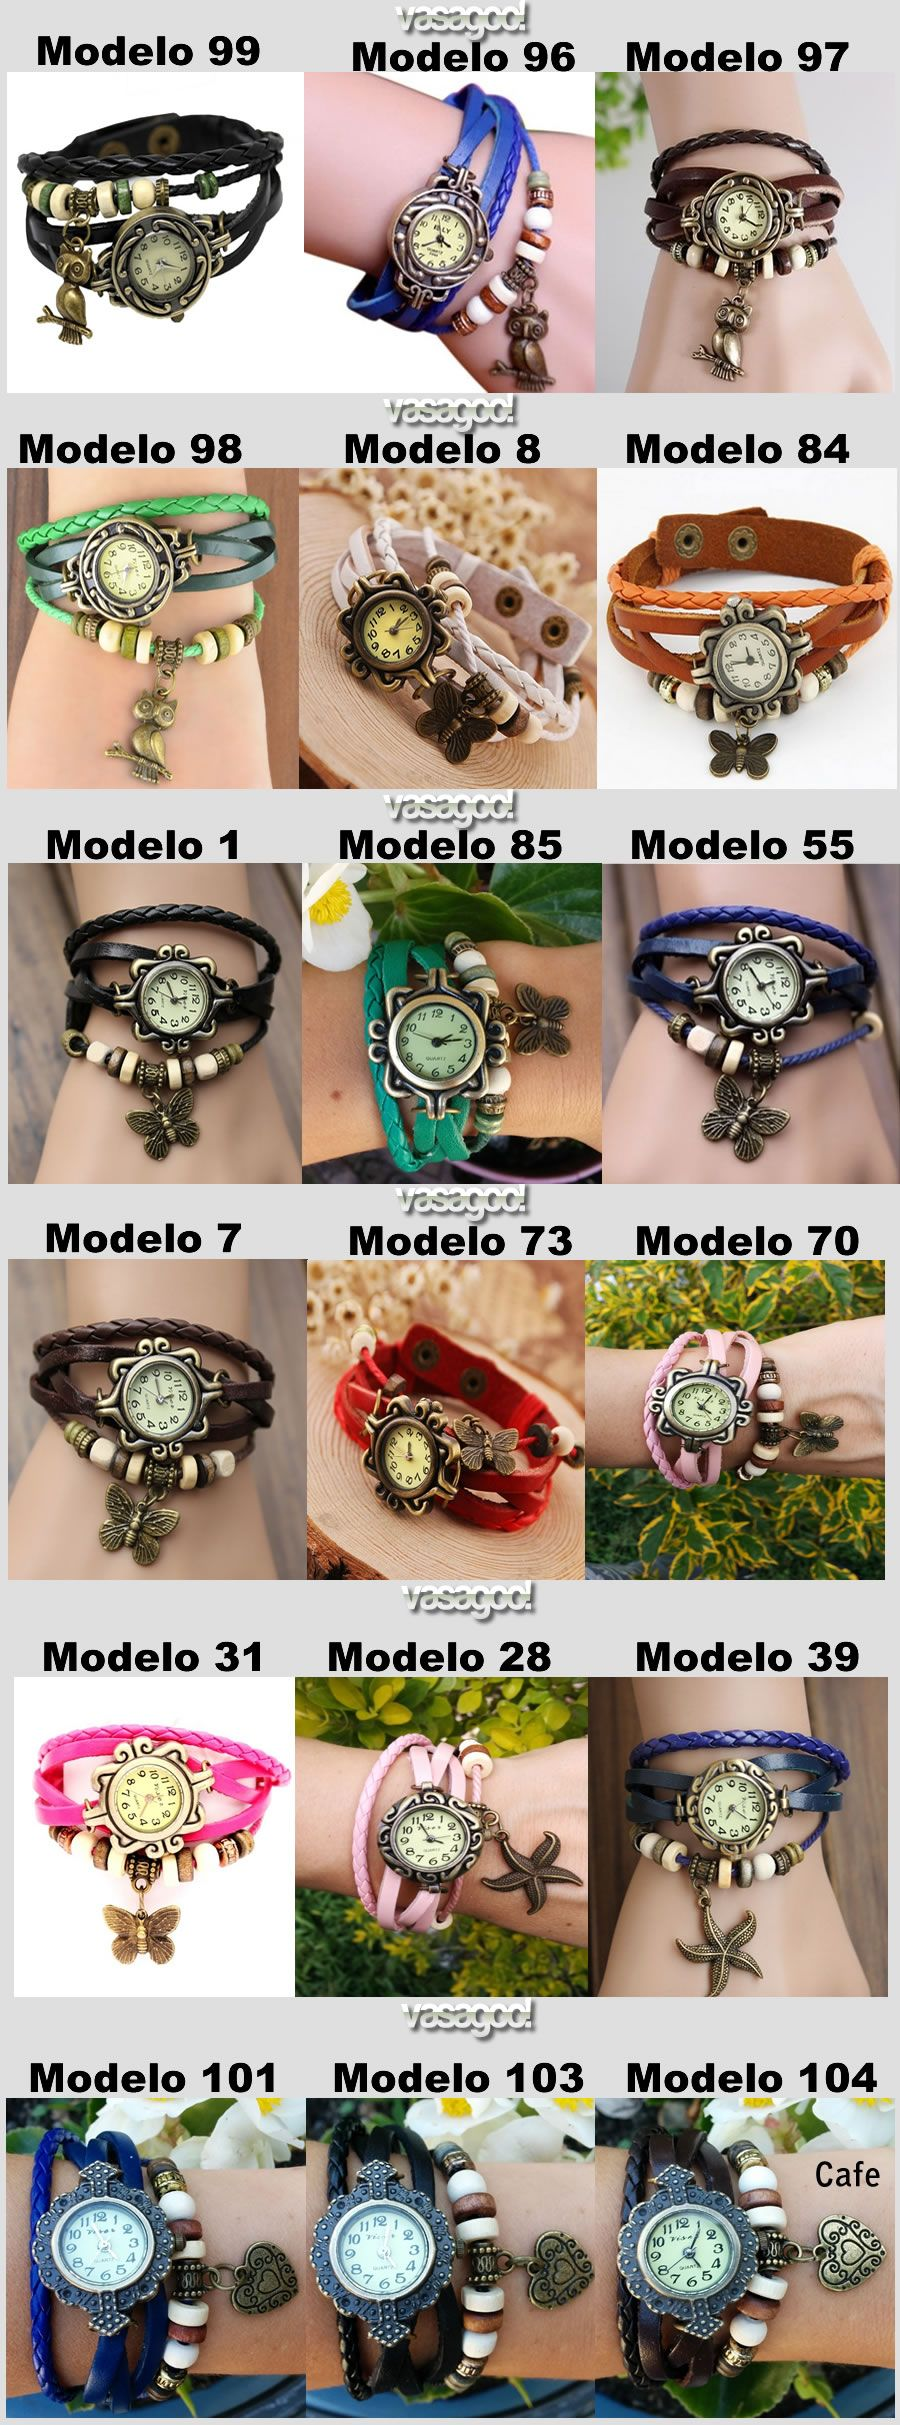 Reloj Pulsera Dama Mujer Manilla De Cuero Vintage 16 Disenos 7 900 Reloj Reloj Pulsera Reloj Pulsera Mujer